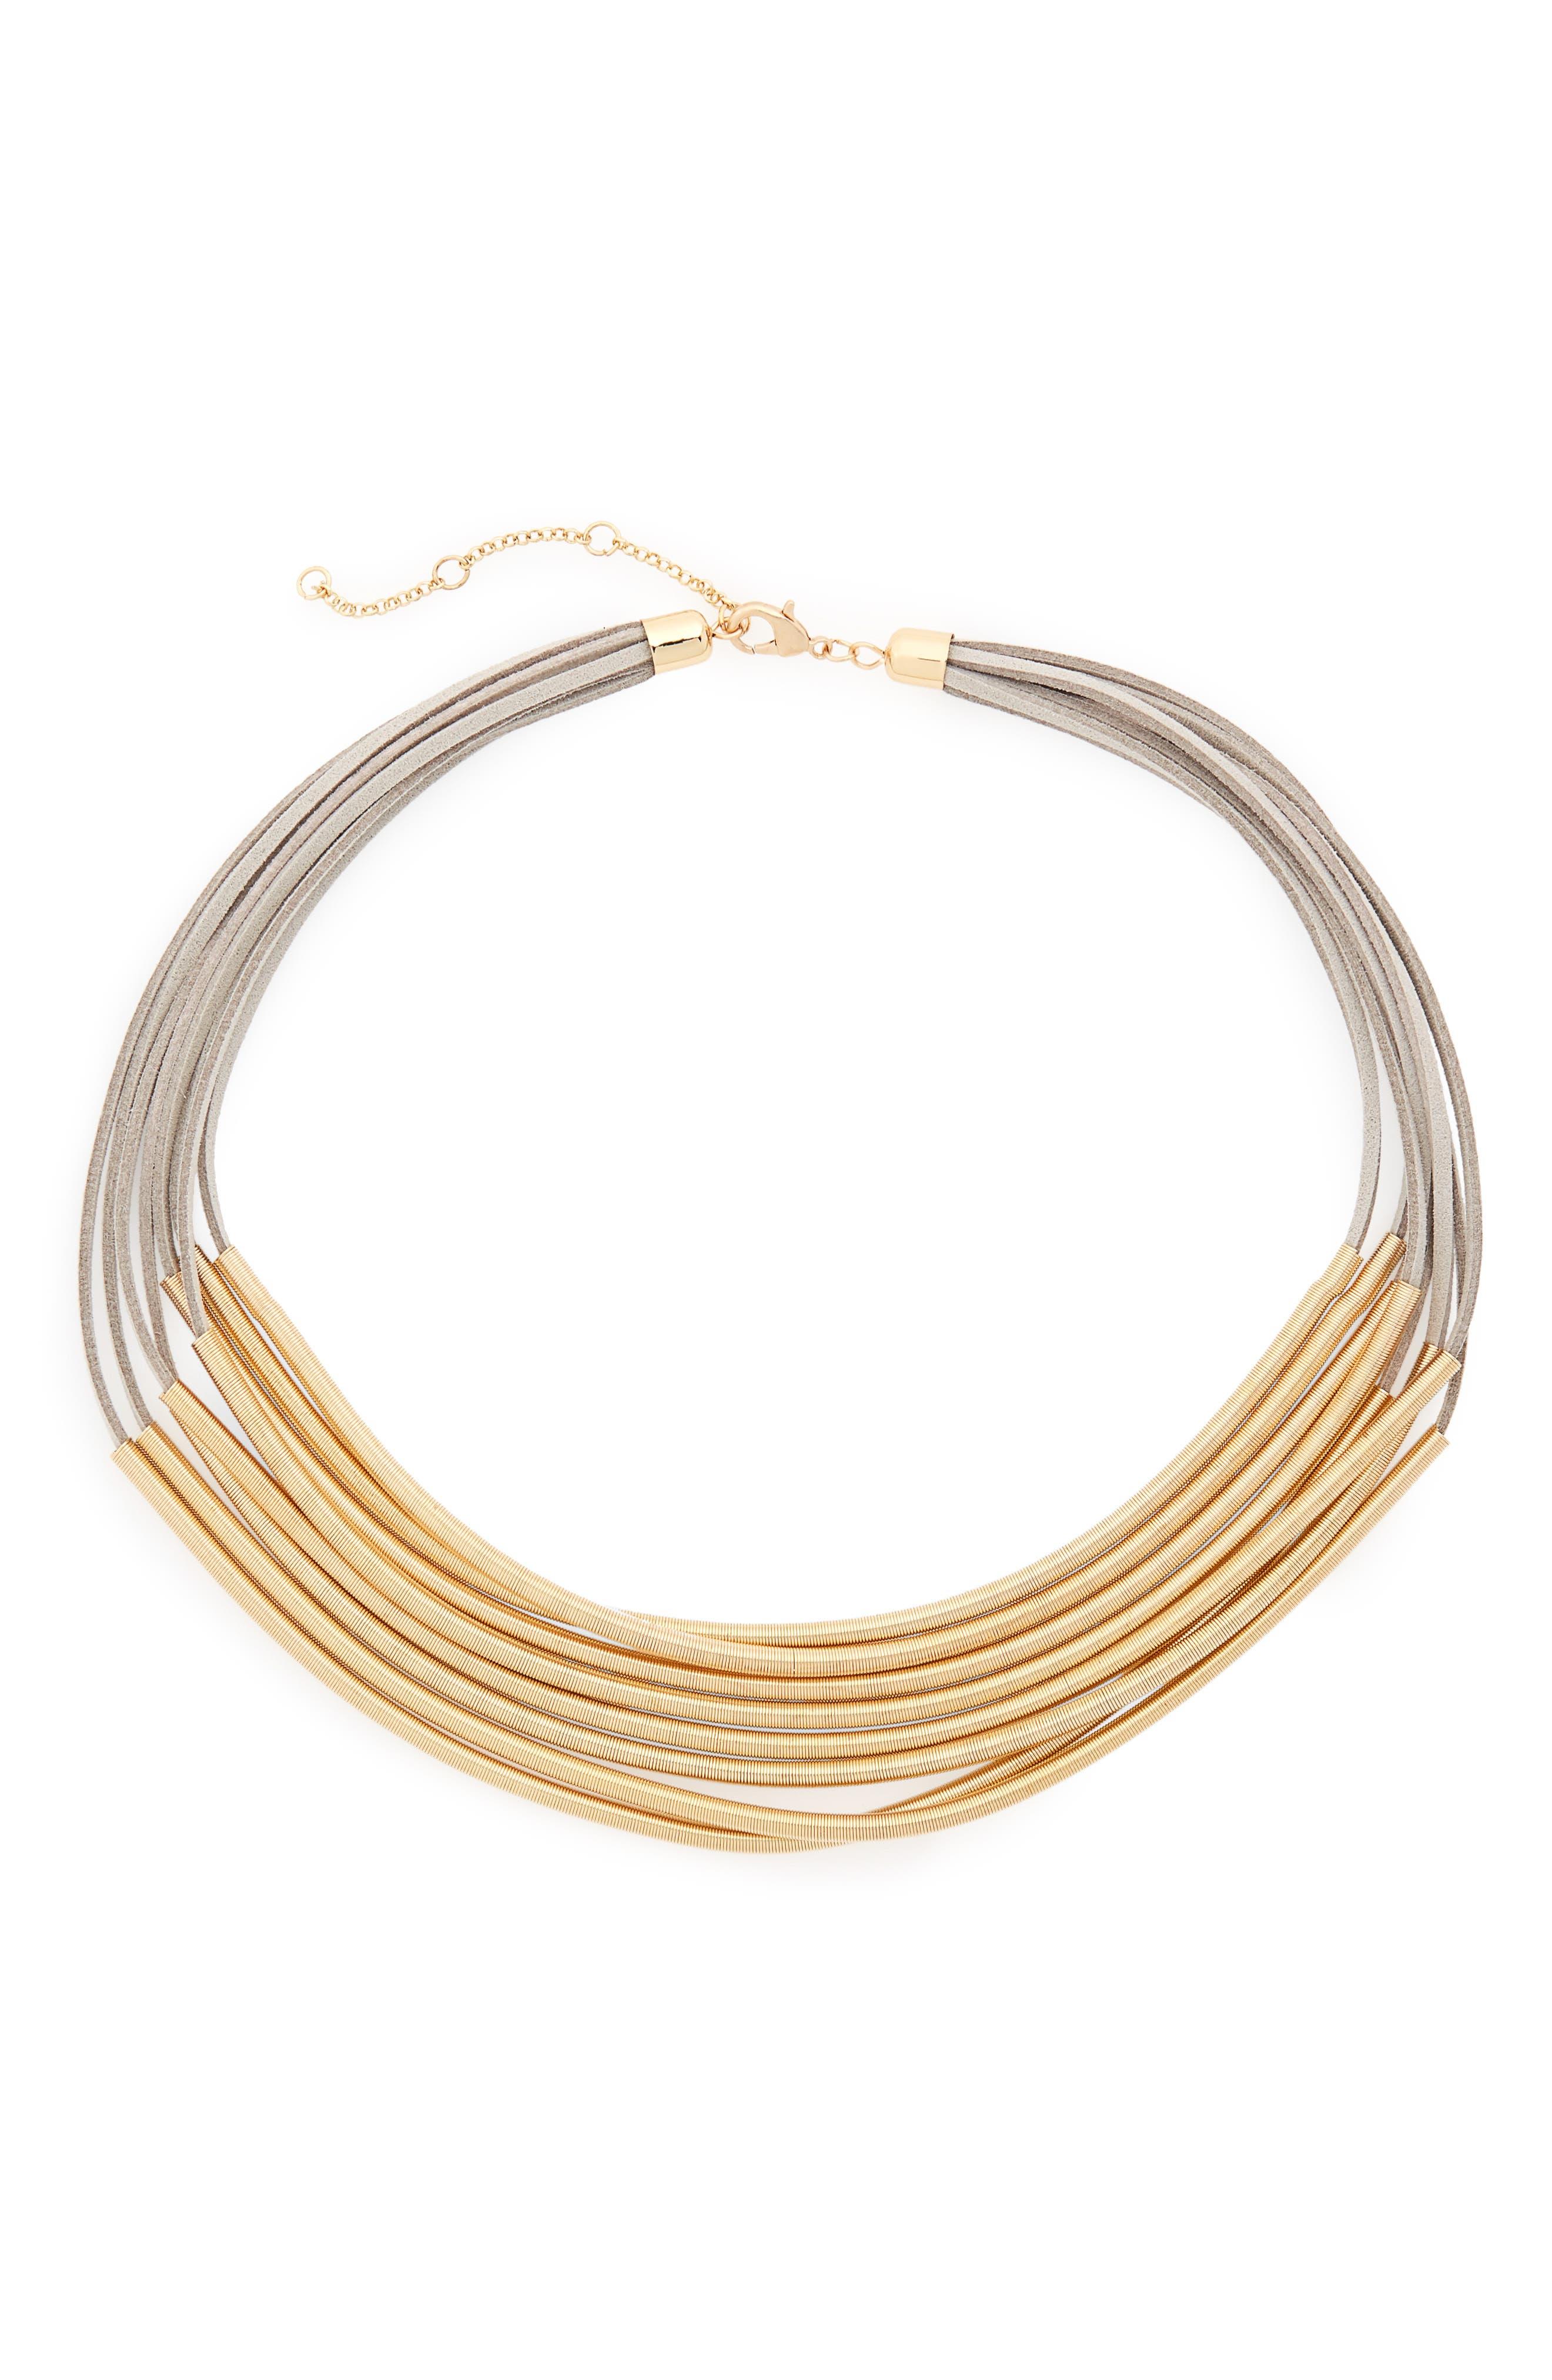 Coil Collar Necklace,                             Main thumbnail 1, color,                             710